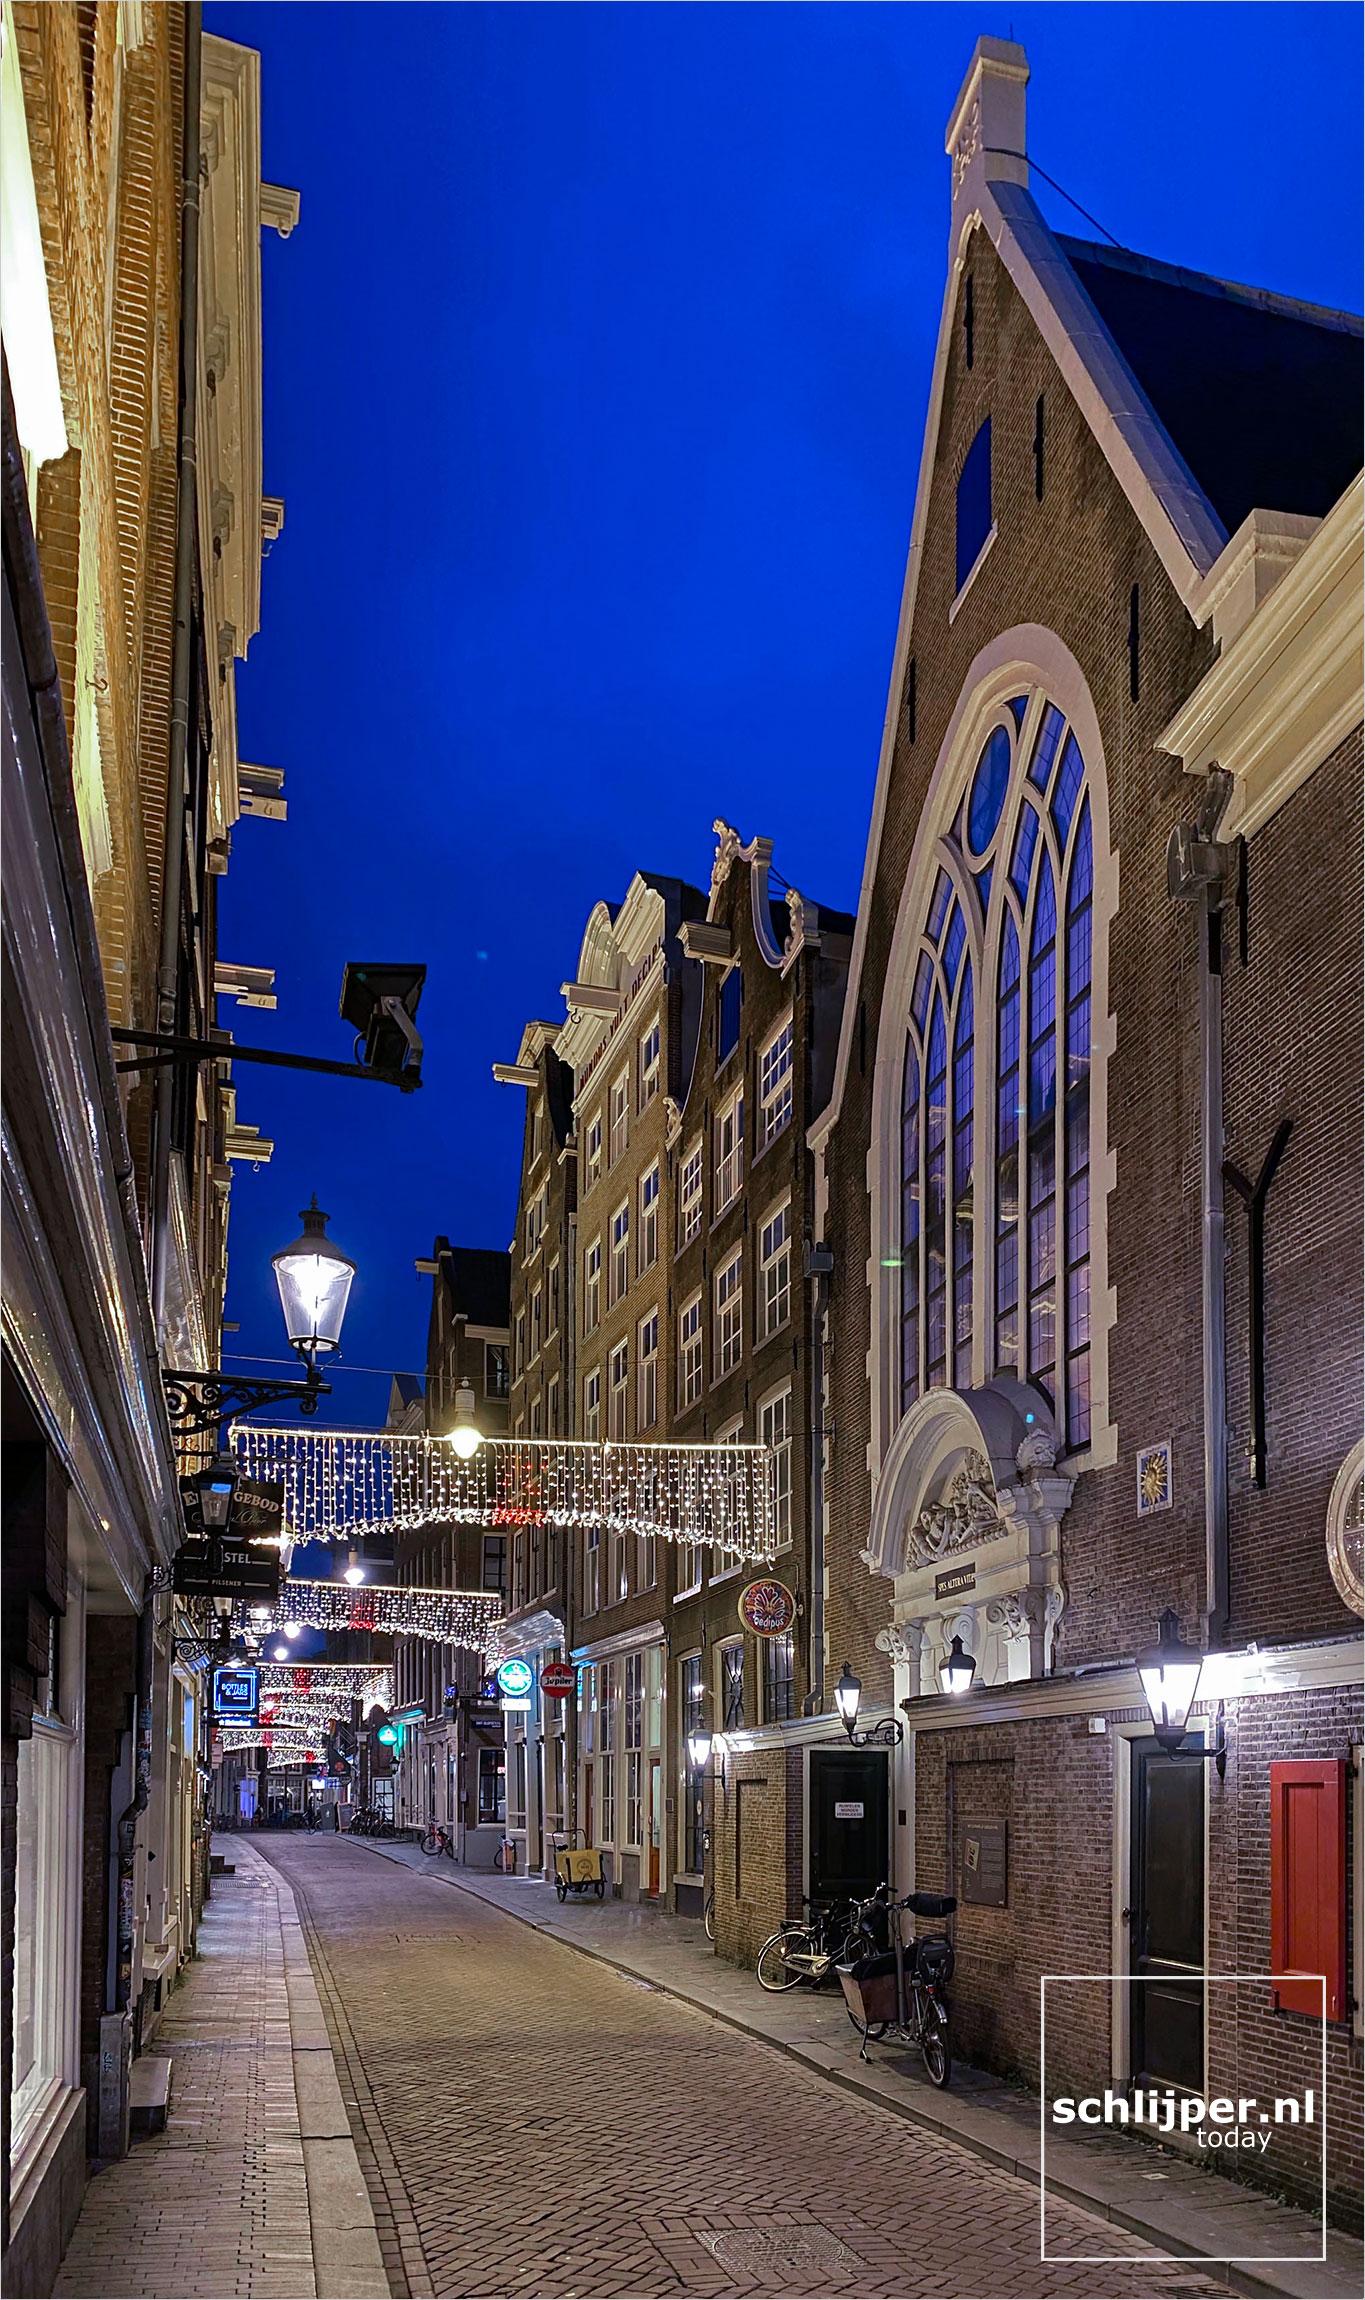 The Netherlands, Amsterdam, 8 december 2020